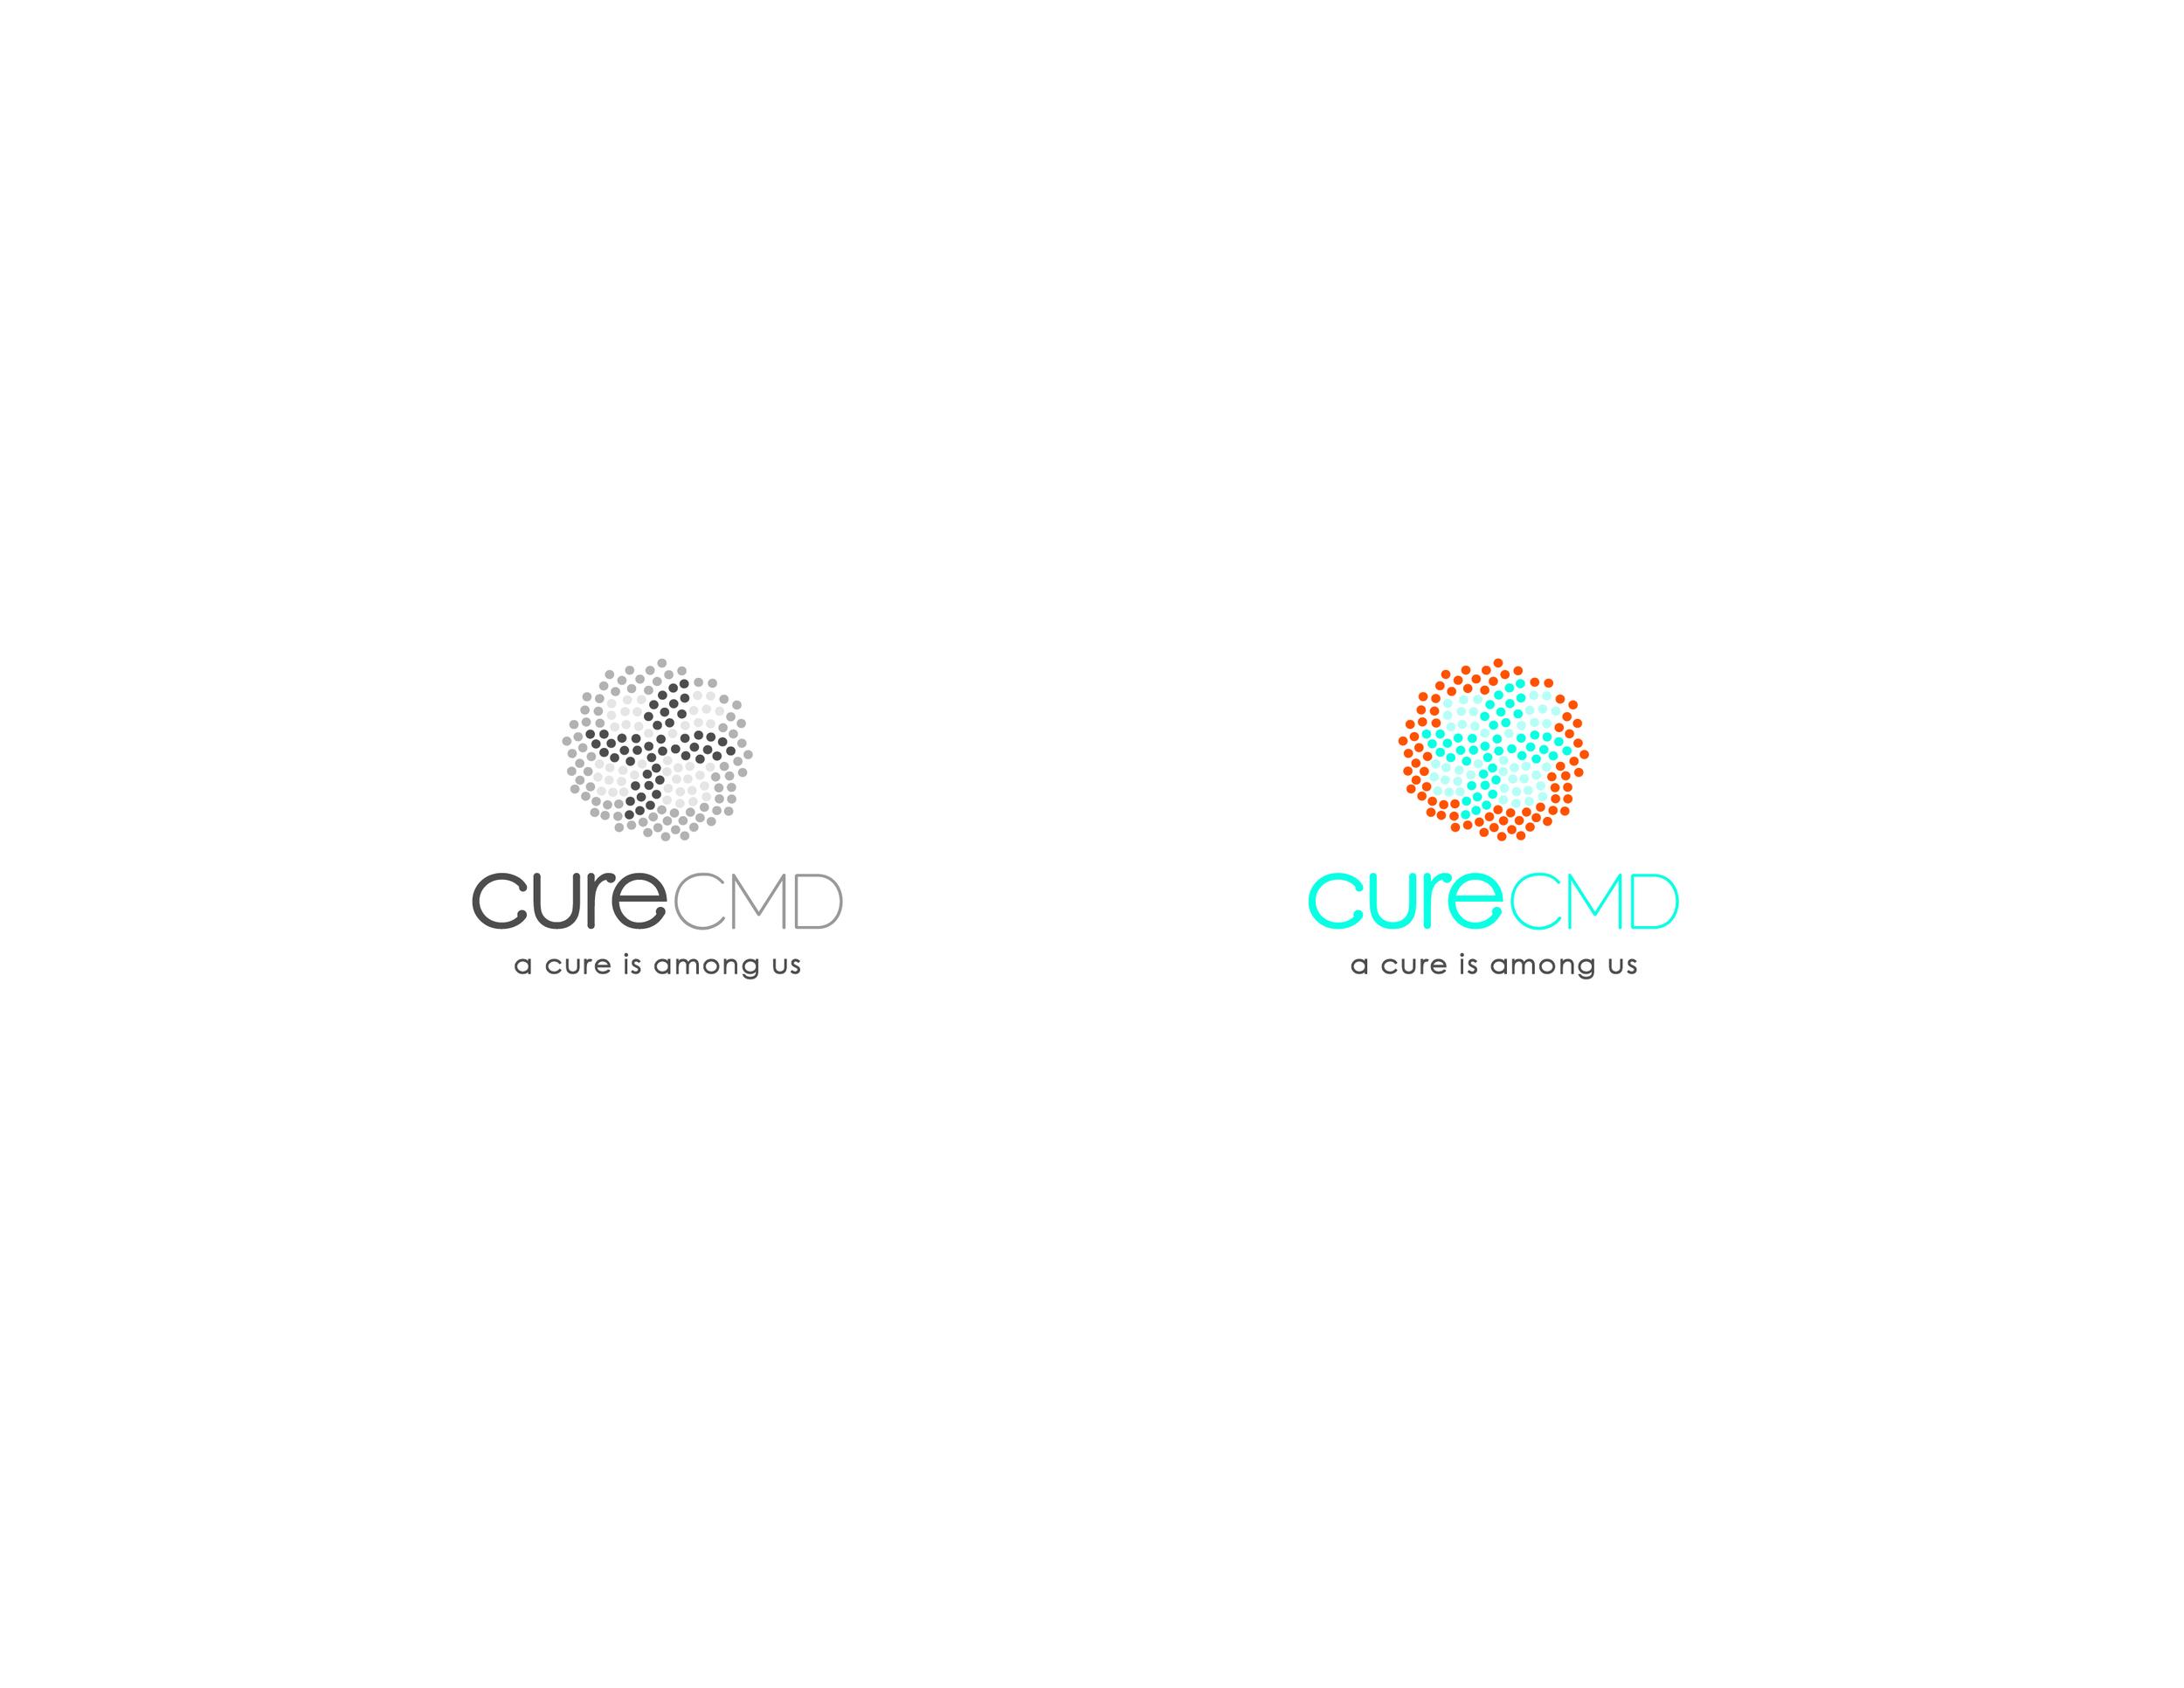 cure_CMD_logo_ideas-02.jpg